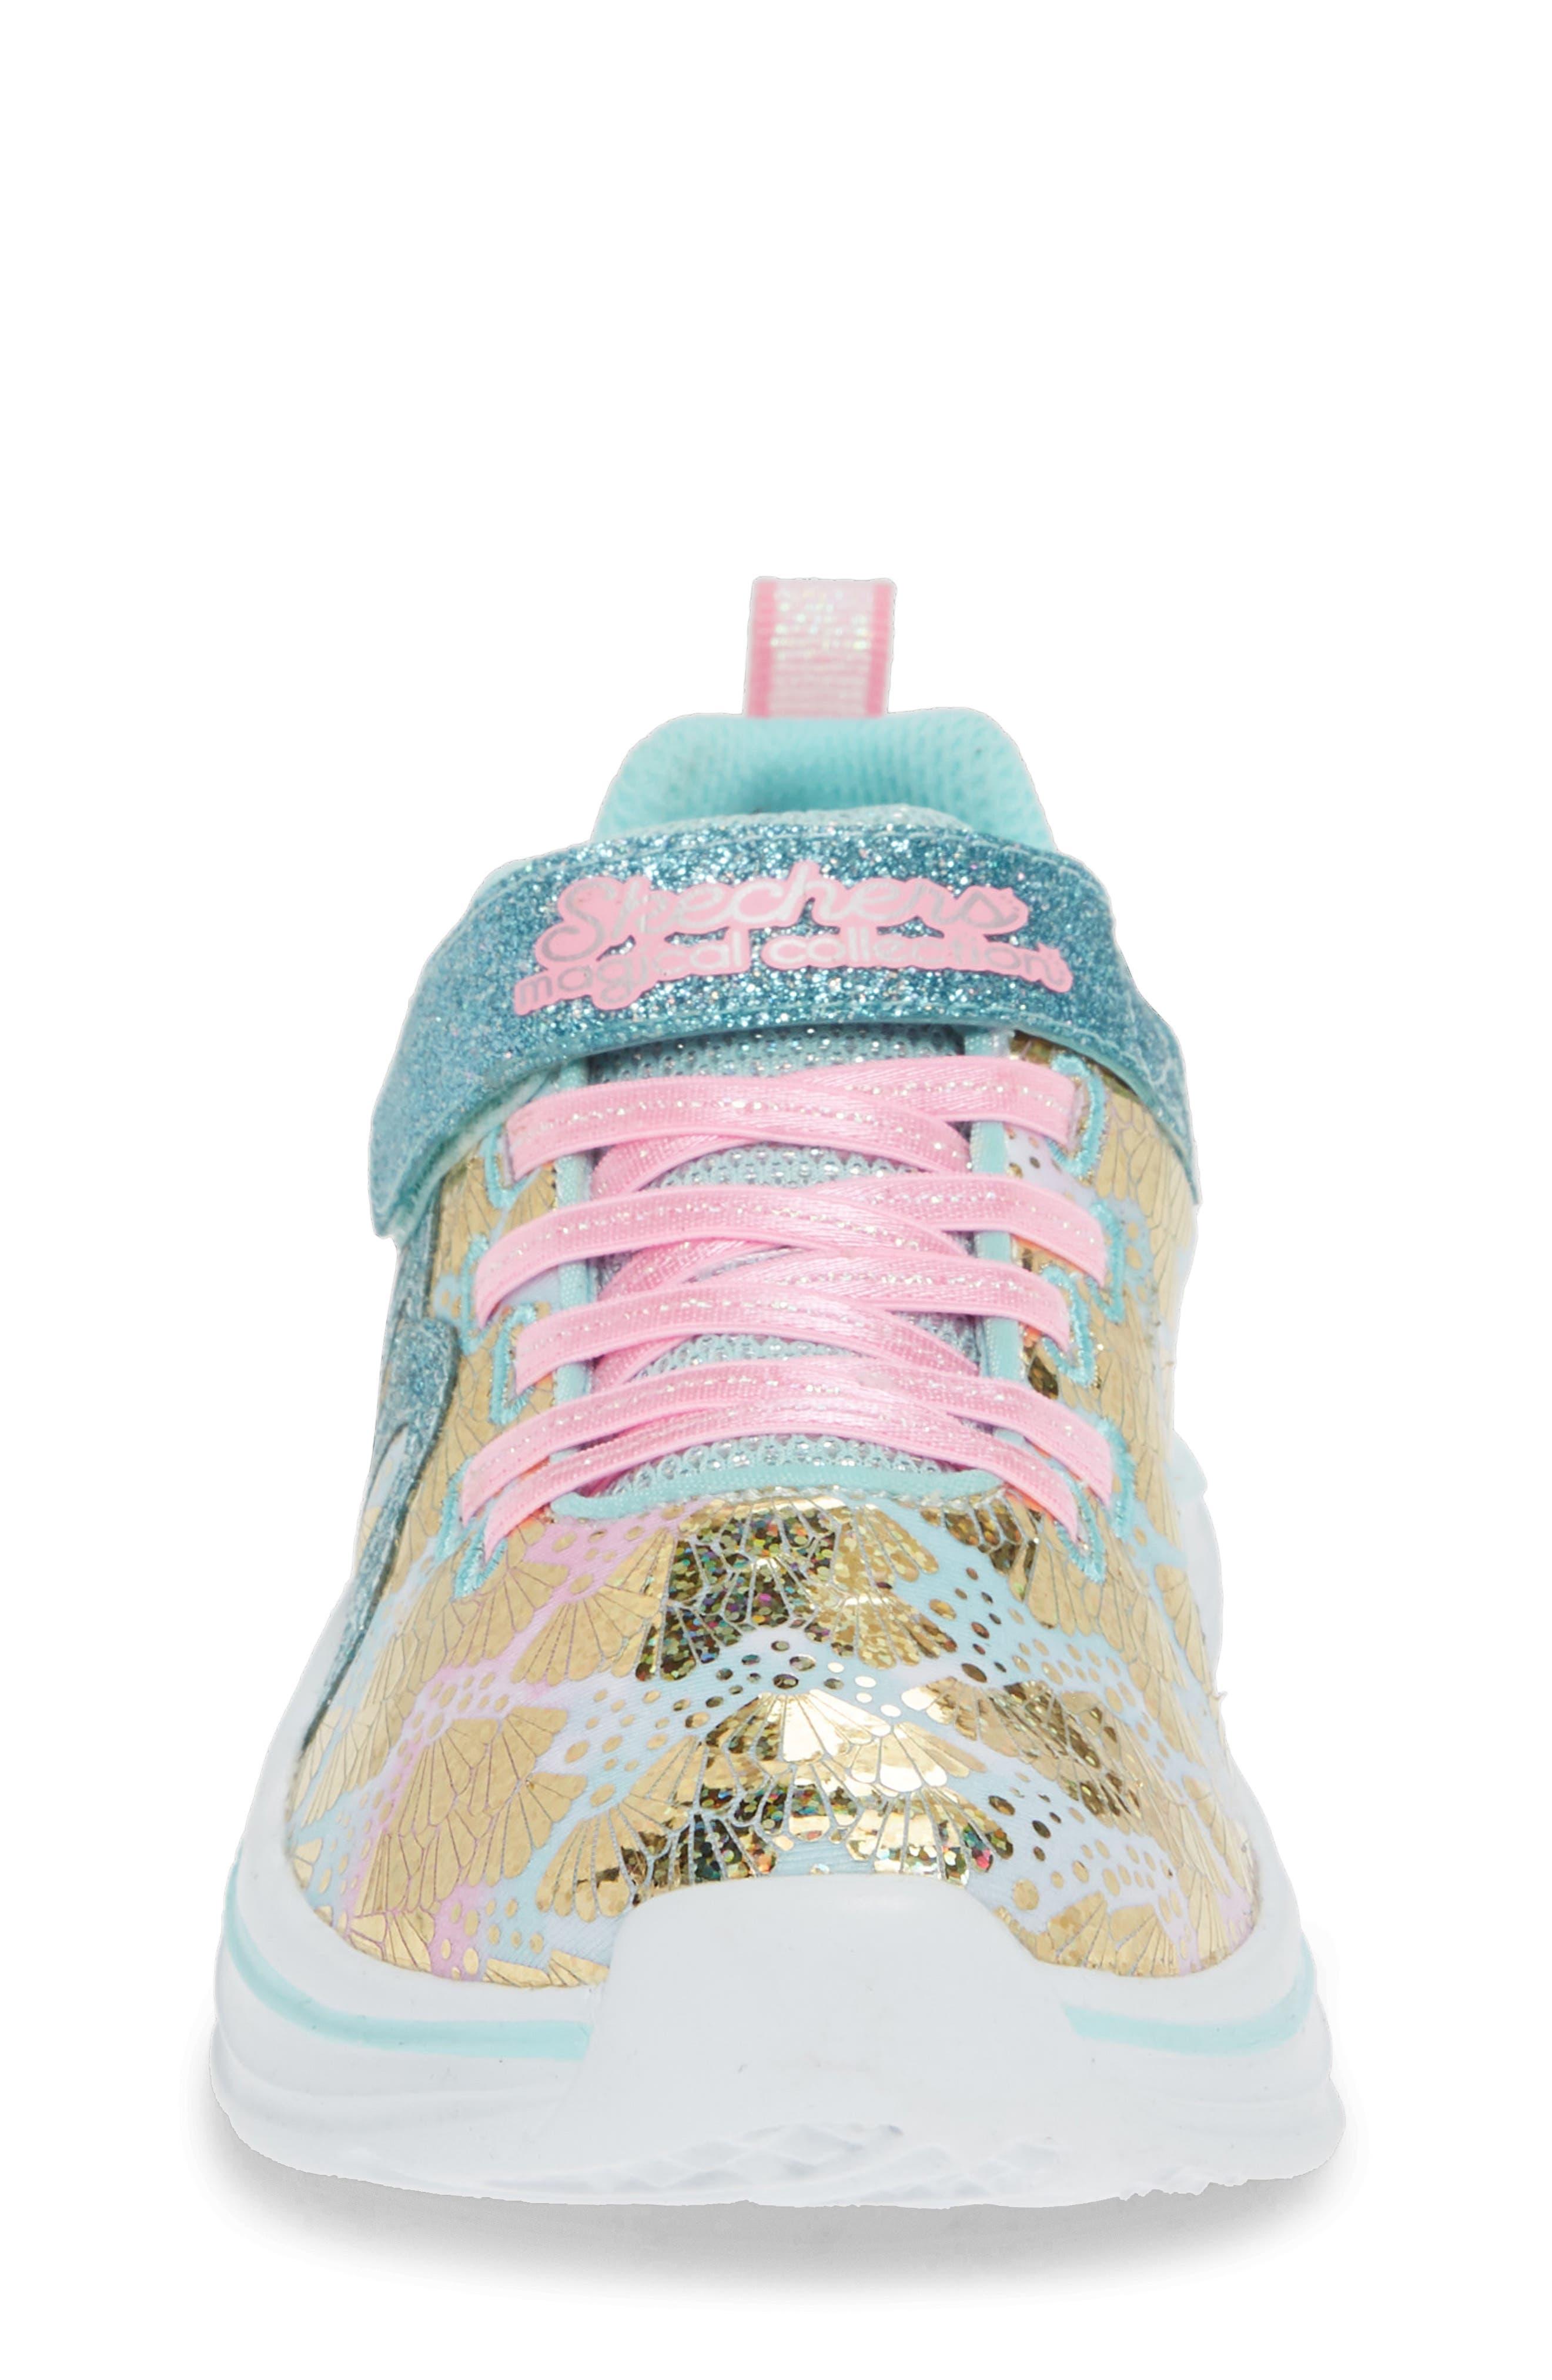 SKECHERS, Double Dreams Shimmer Sneaker, Alternate thumbnail 4, color, AQUA/ PINK TEXTILE